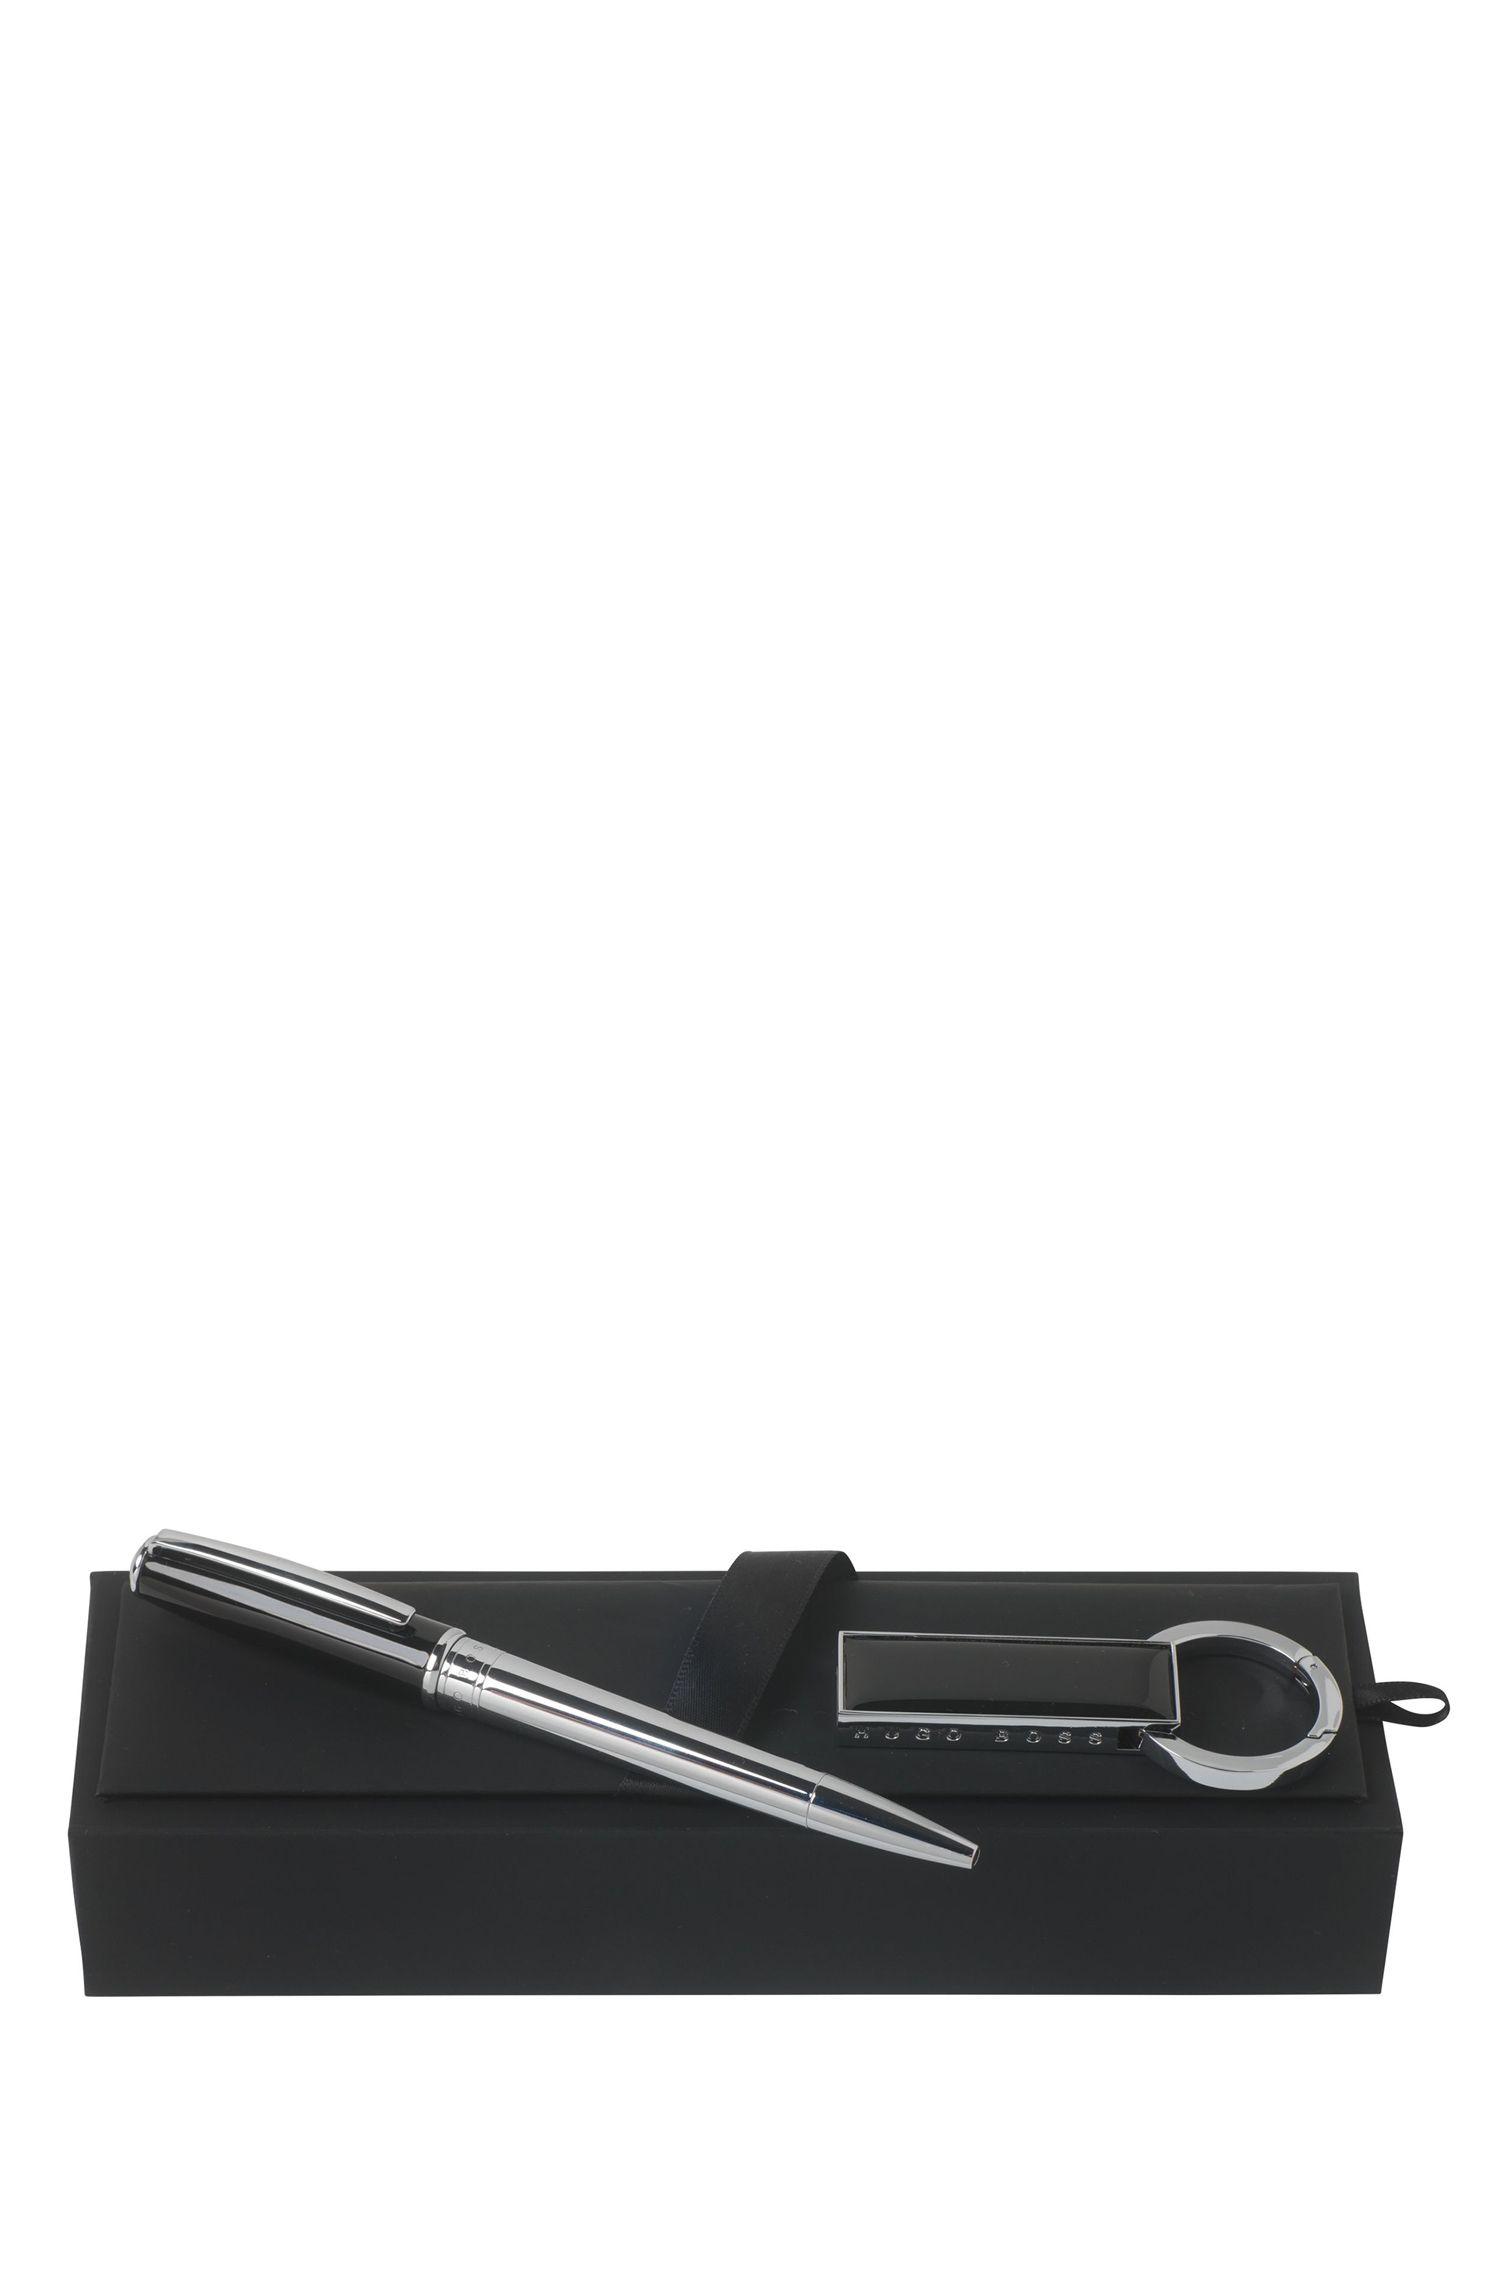 Brass Ballpoint Ben, USB Stick Set | Essential Set